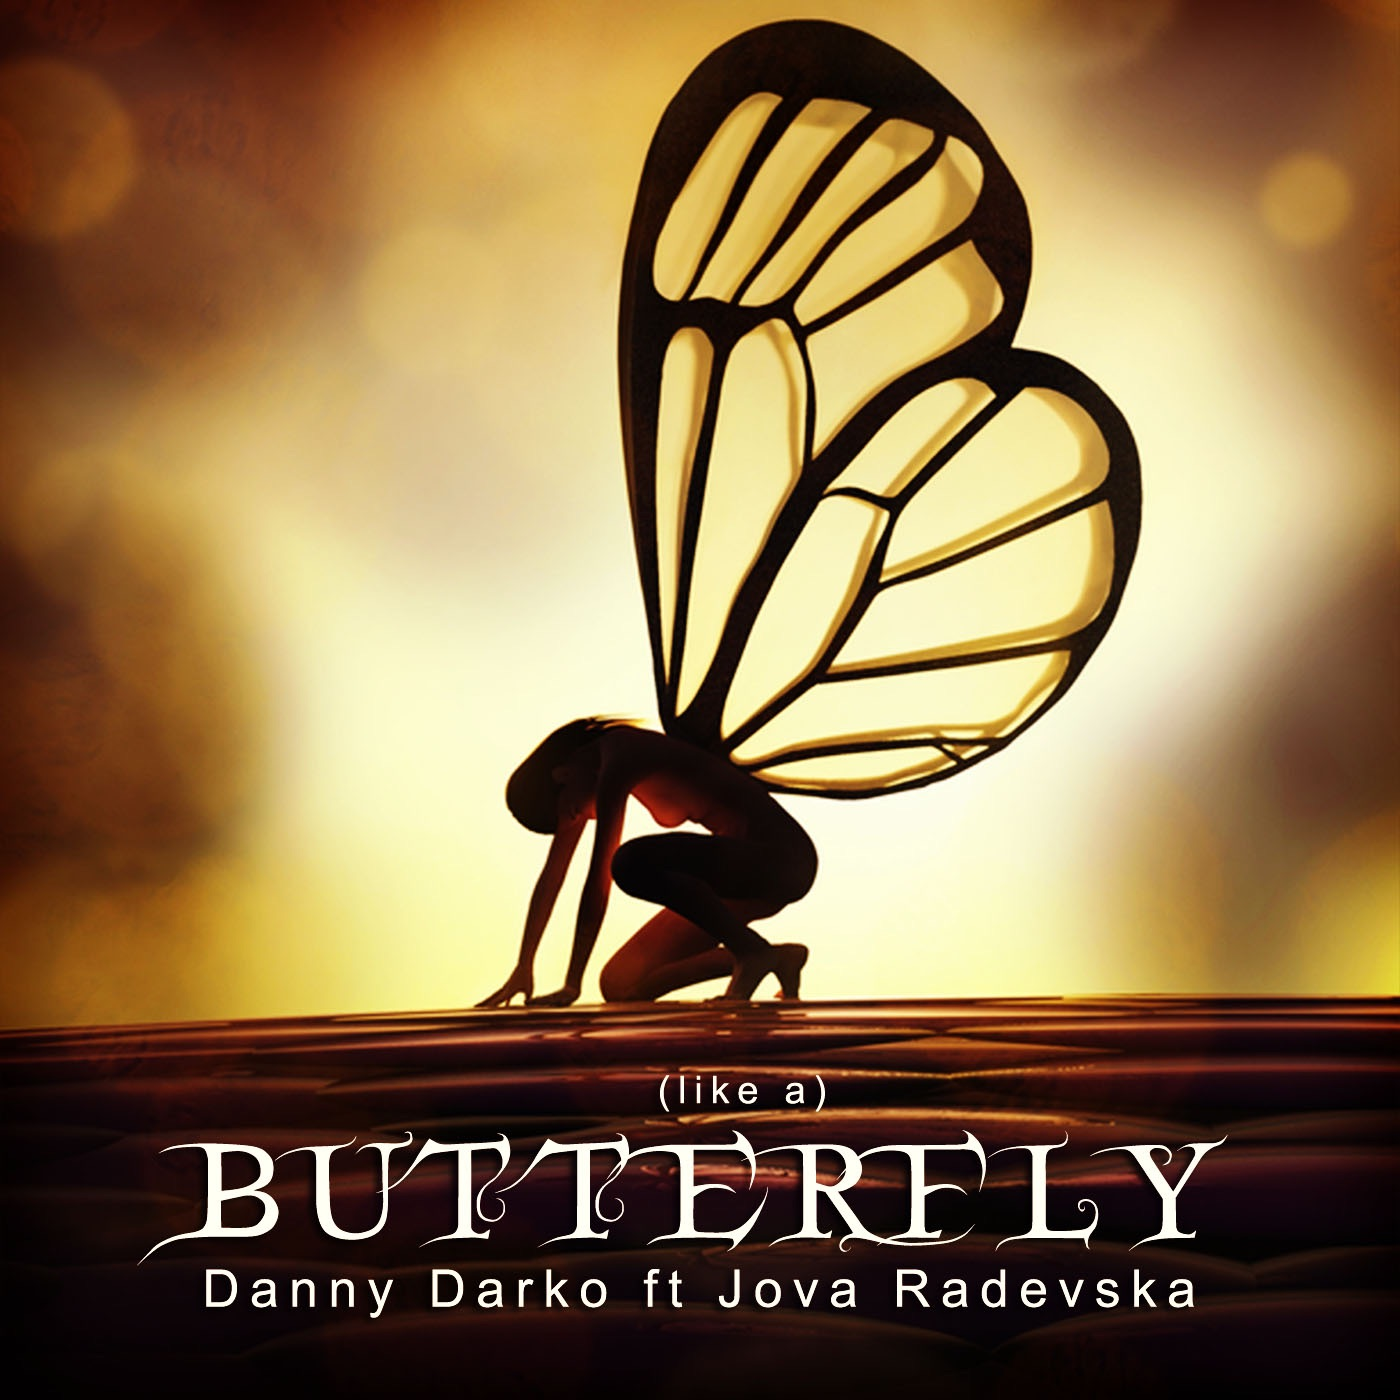 Butterfly (feat. Jova Radevska) - Single